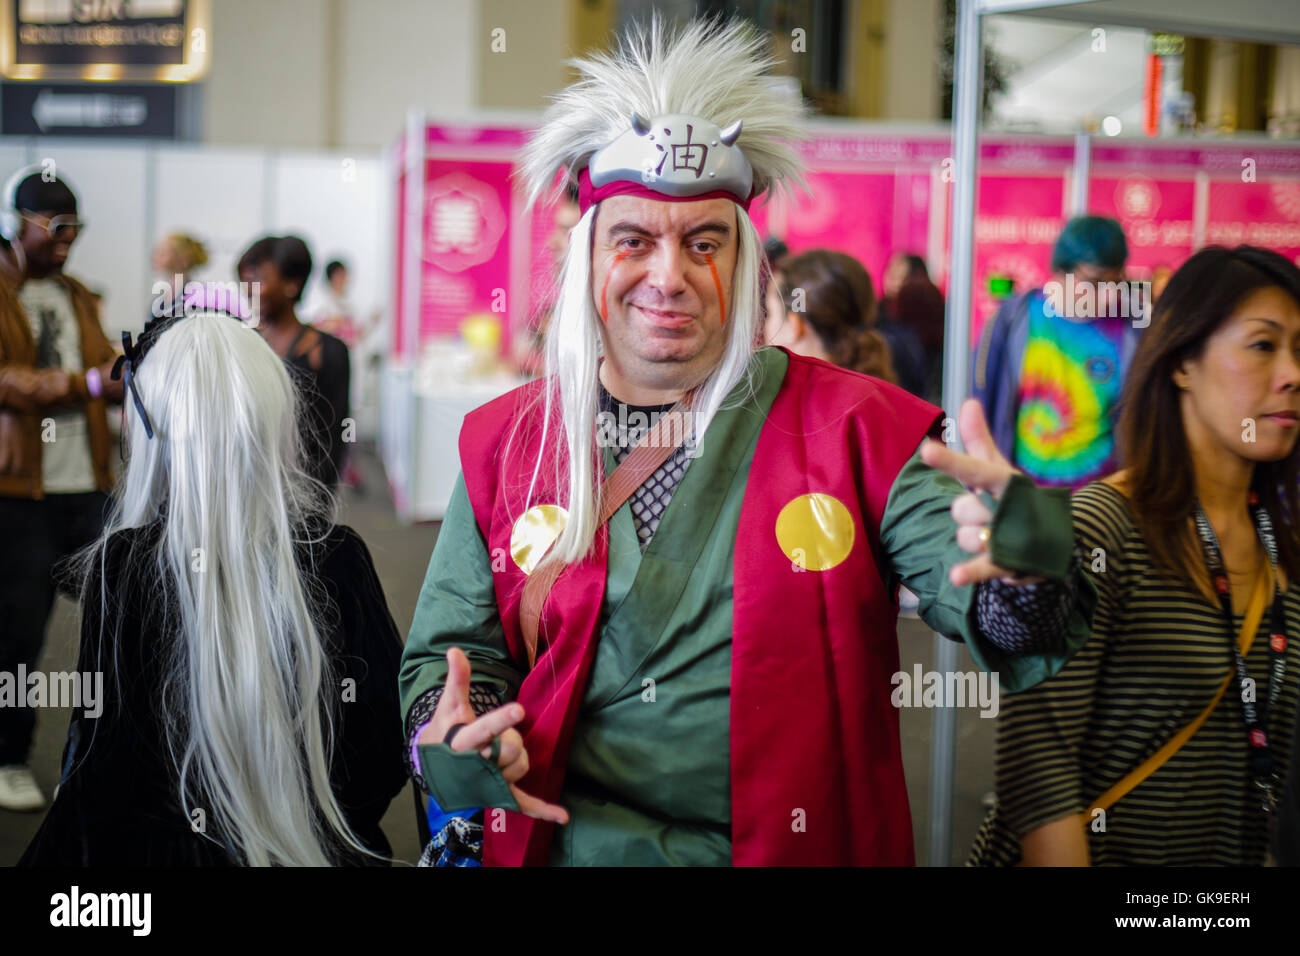 Naruto Cosplay Stock Photos Naruto Cosplay Stock Images Alamy